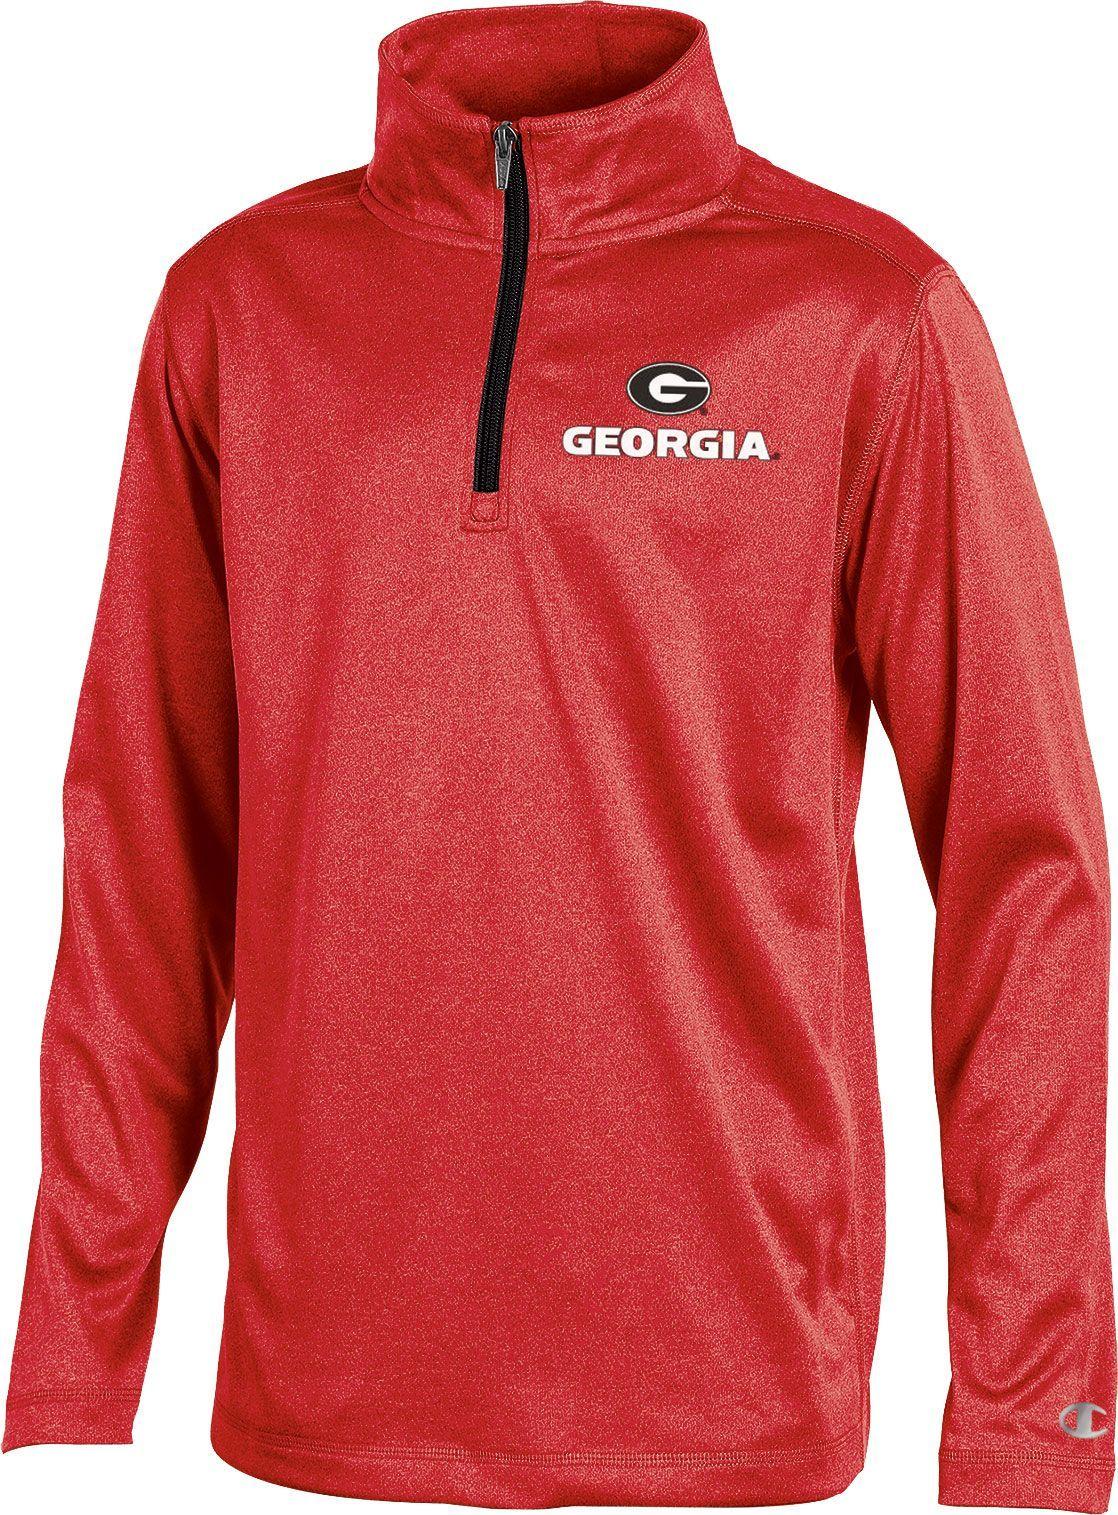 30f51b4b Champion Youth Georgia Bulldogs Red Quarter-Zip Performance Shirt, Size:  Medium